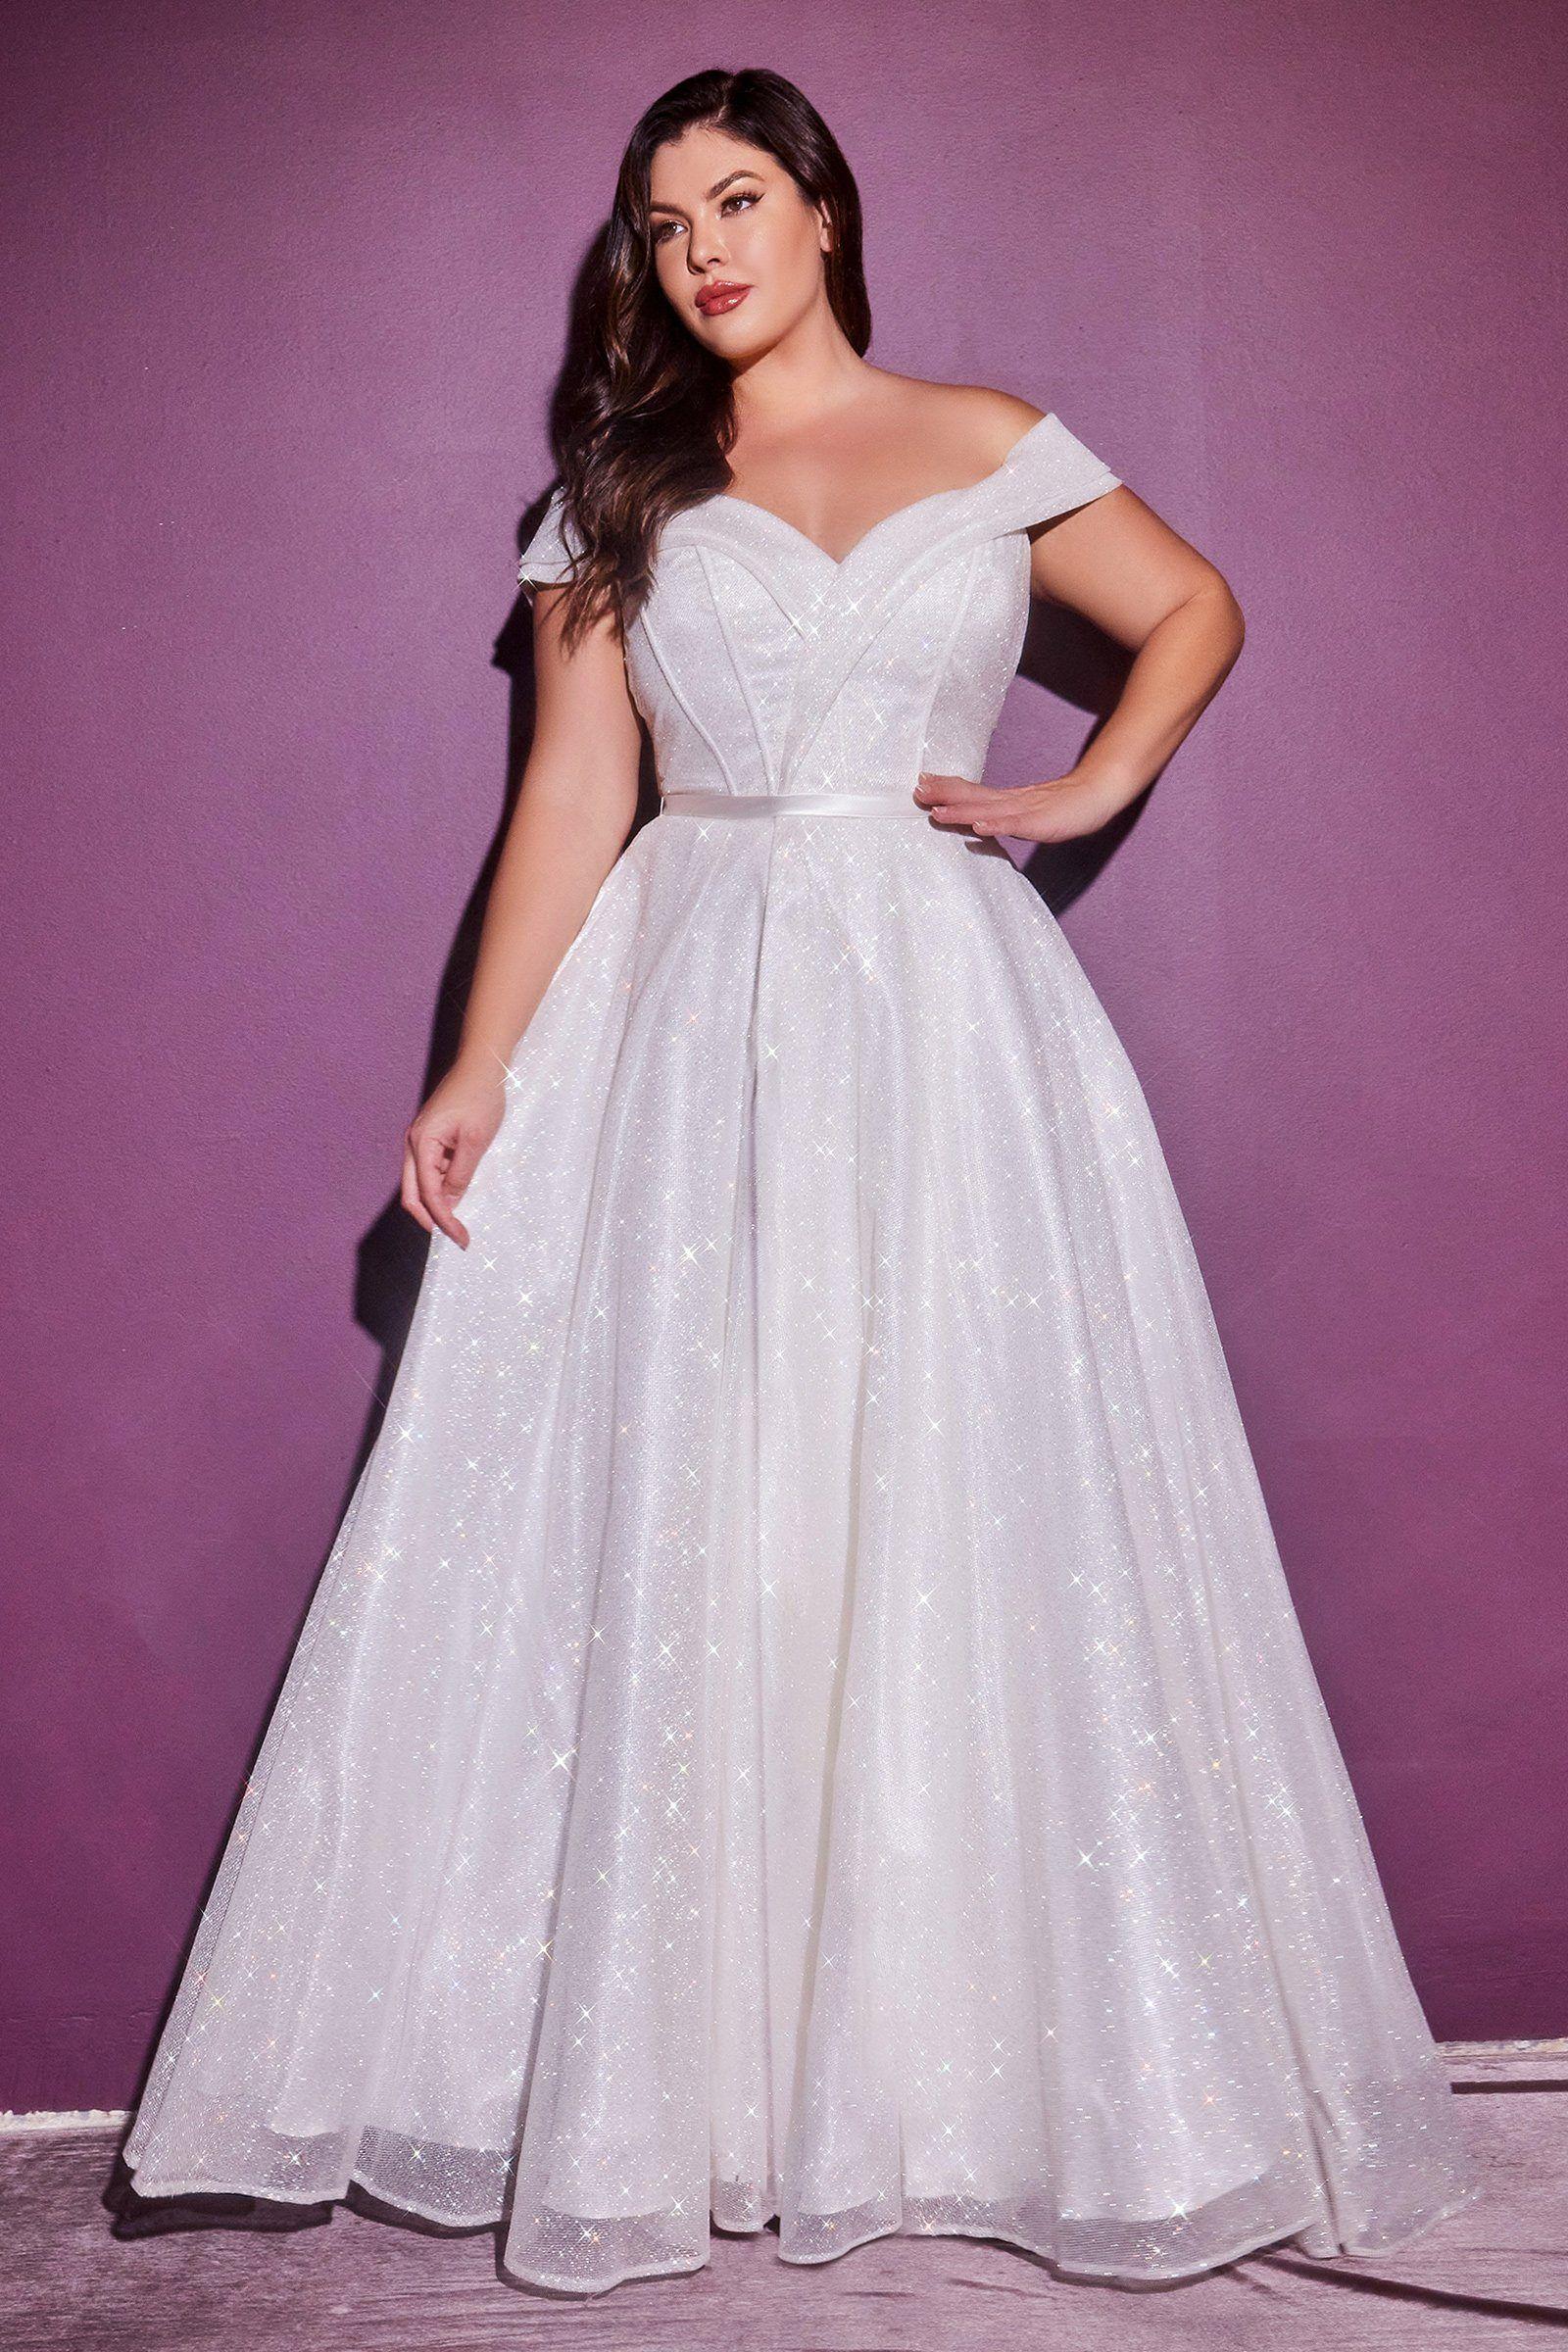 Glitter Bridal Ball Gown By Cinderella Divine Cd214w In 2021 Plus Wedding Dresses Glitter Wedding Dress Bridal Ball Gown [ 2400 x 1600 Pixel ]